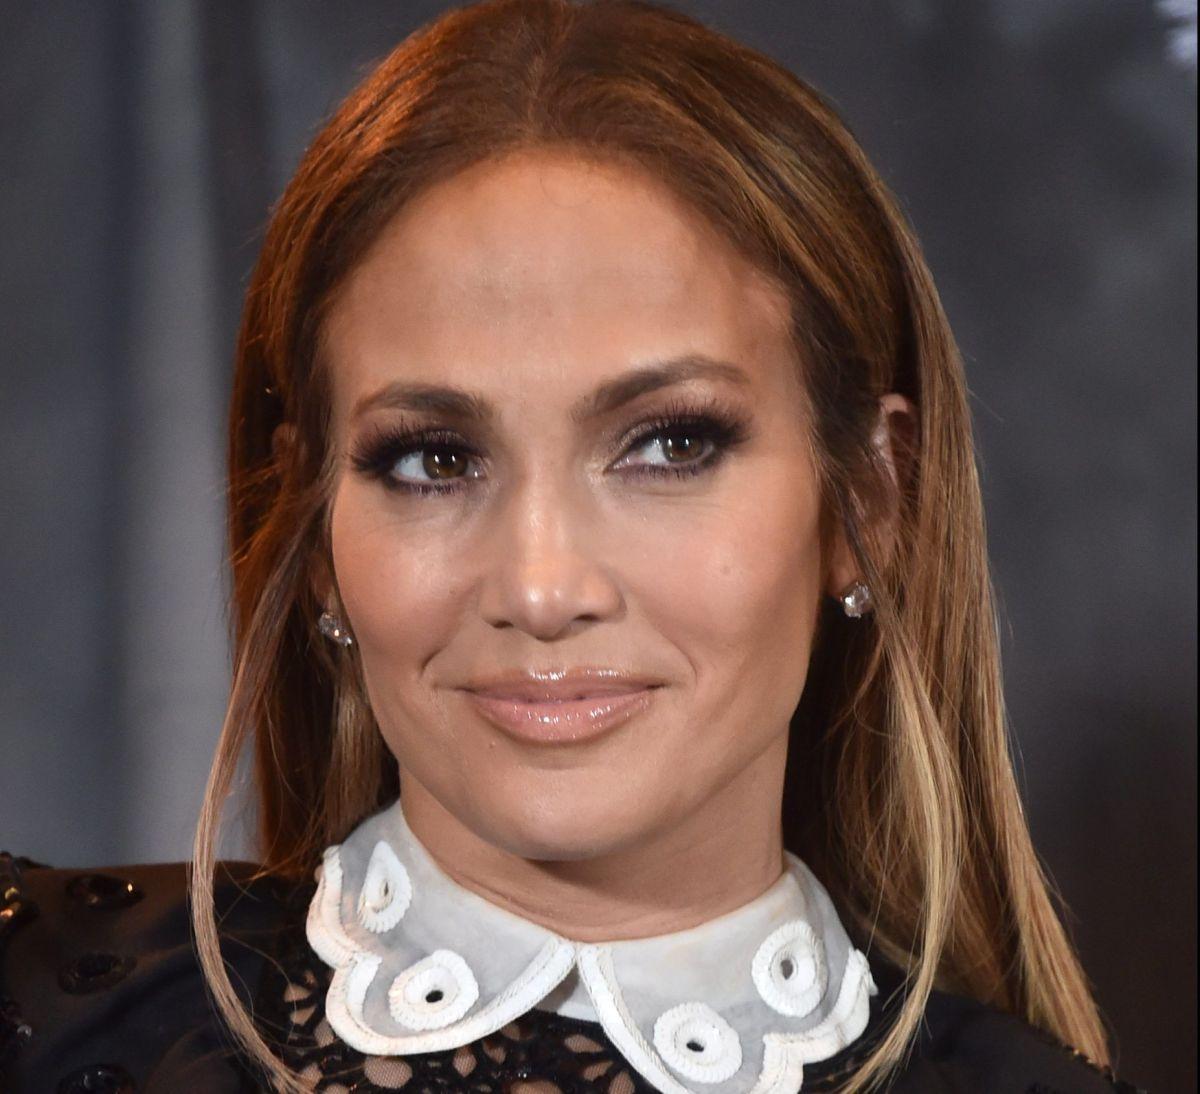 Terrible: director de cine pidió a Jennifer Lopez que le mostrara los senos